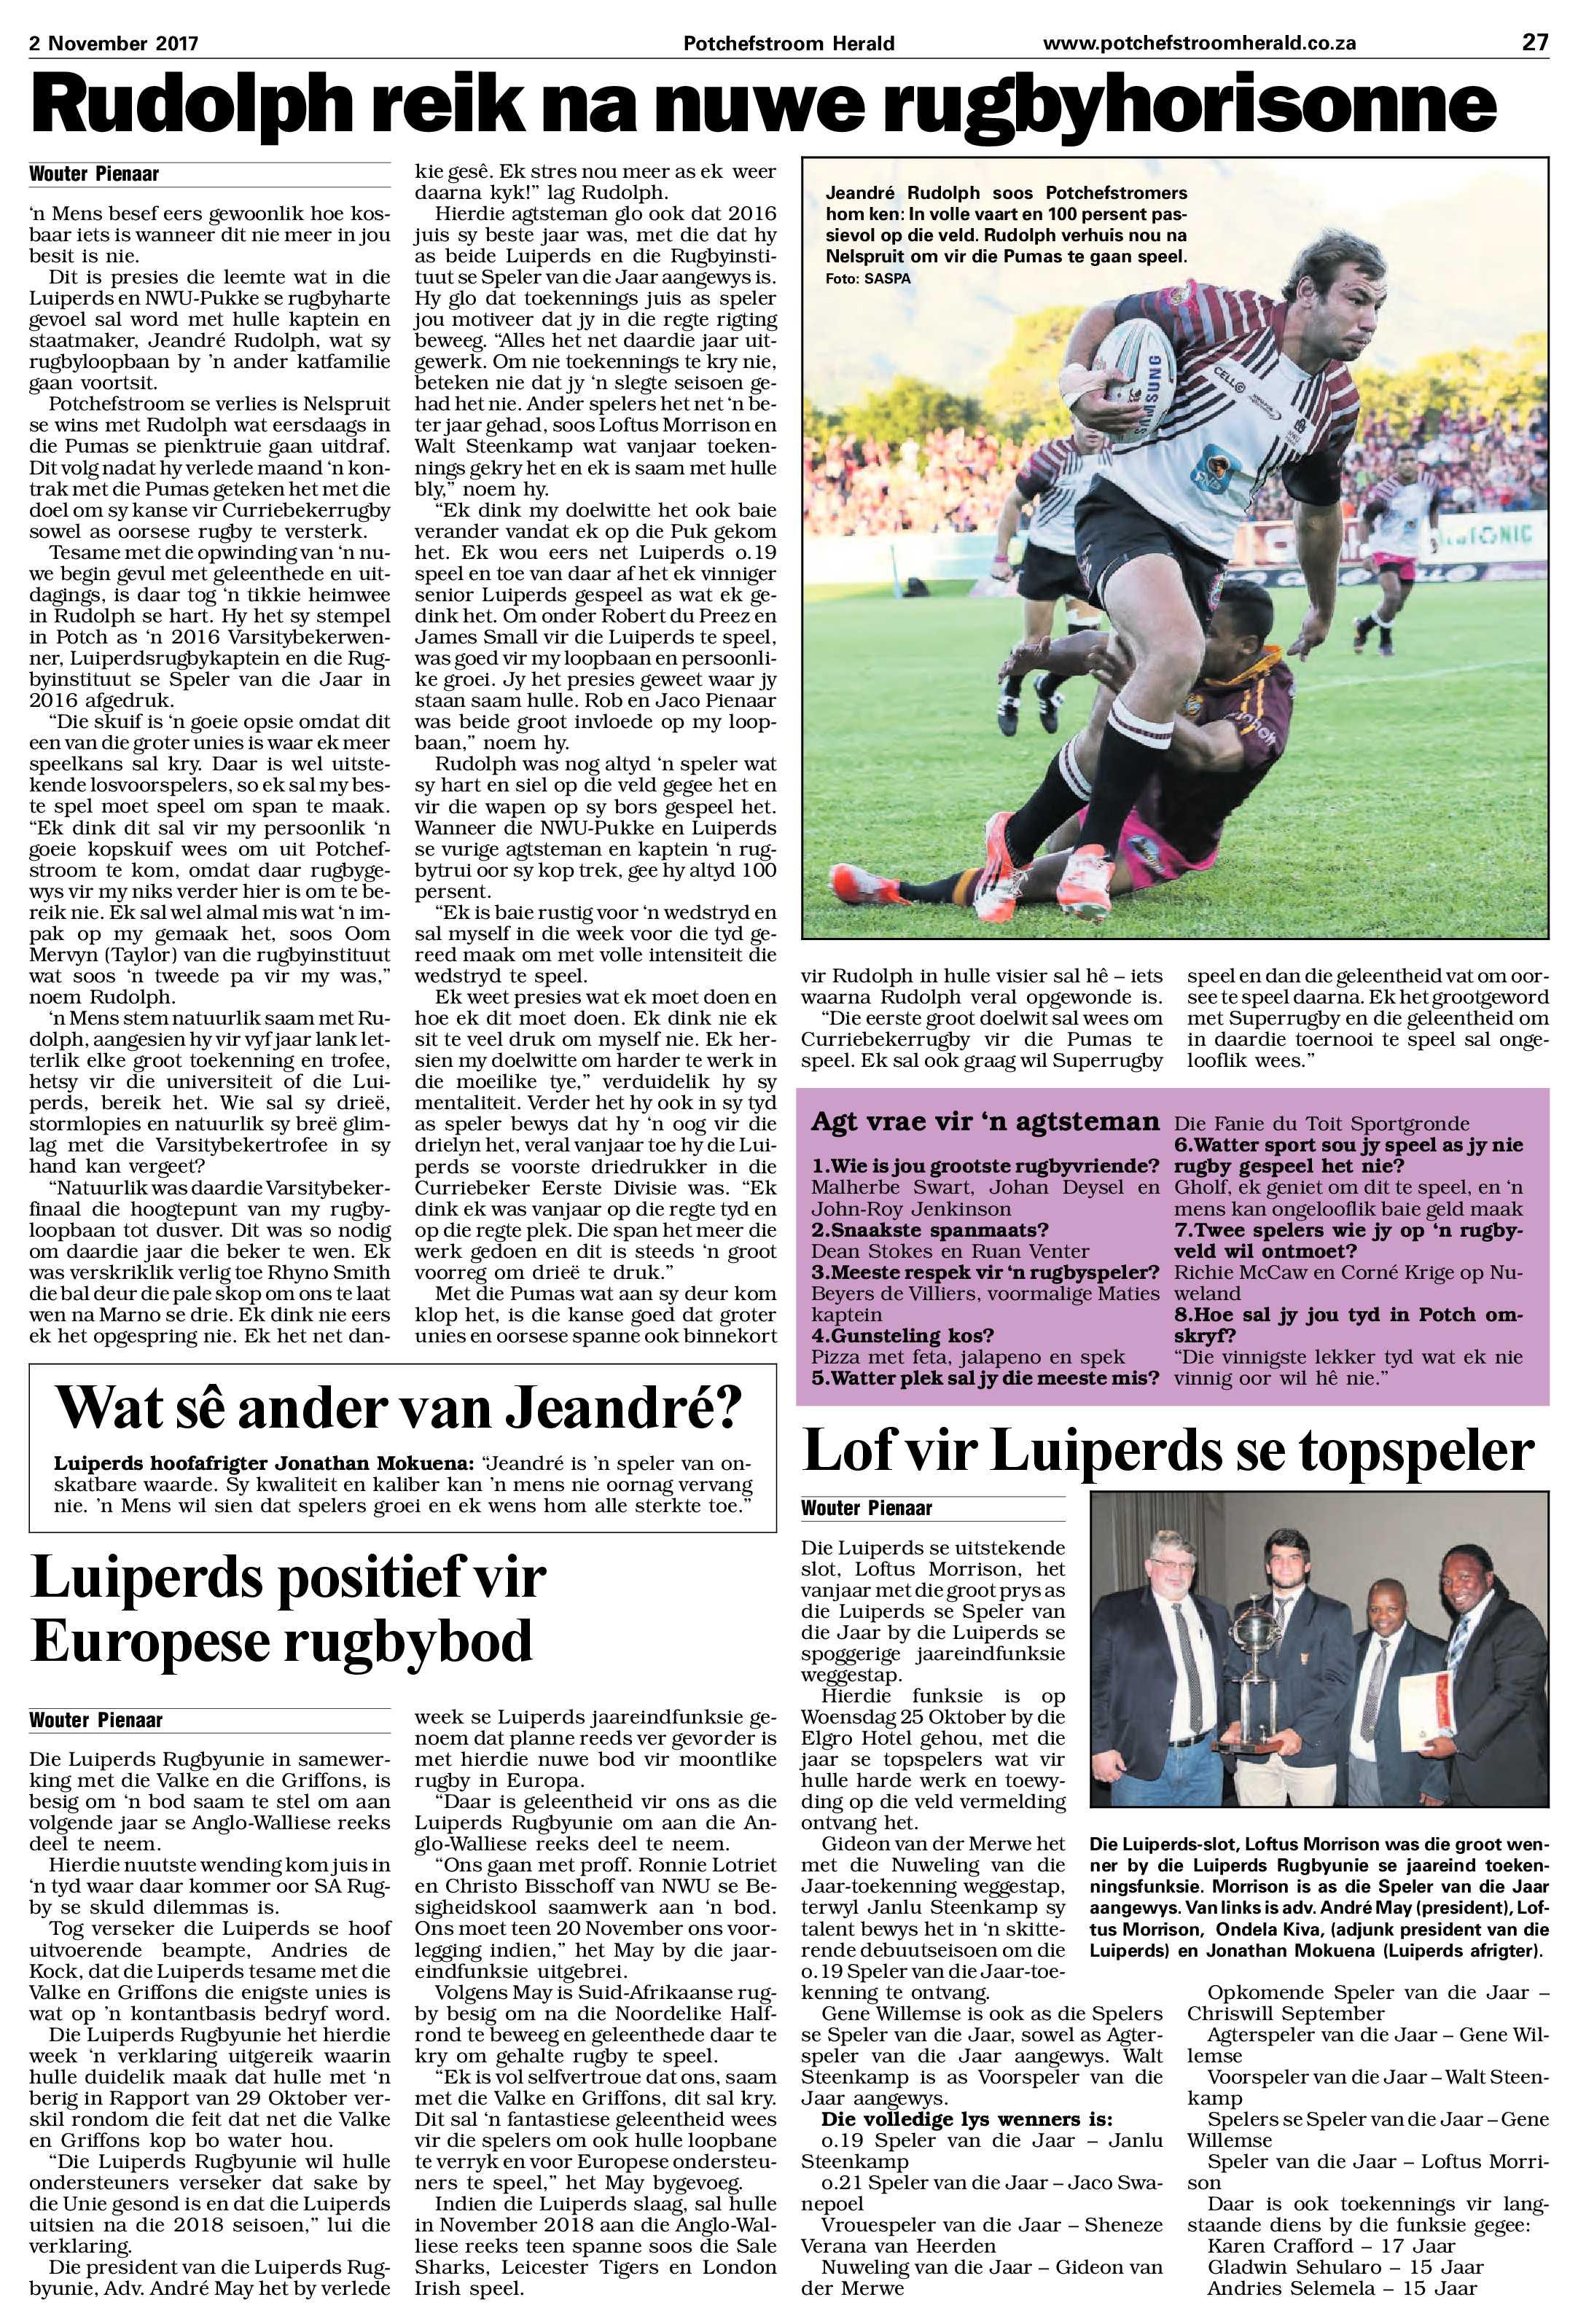 2-november-2017-epapers-page-28